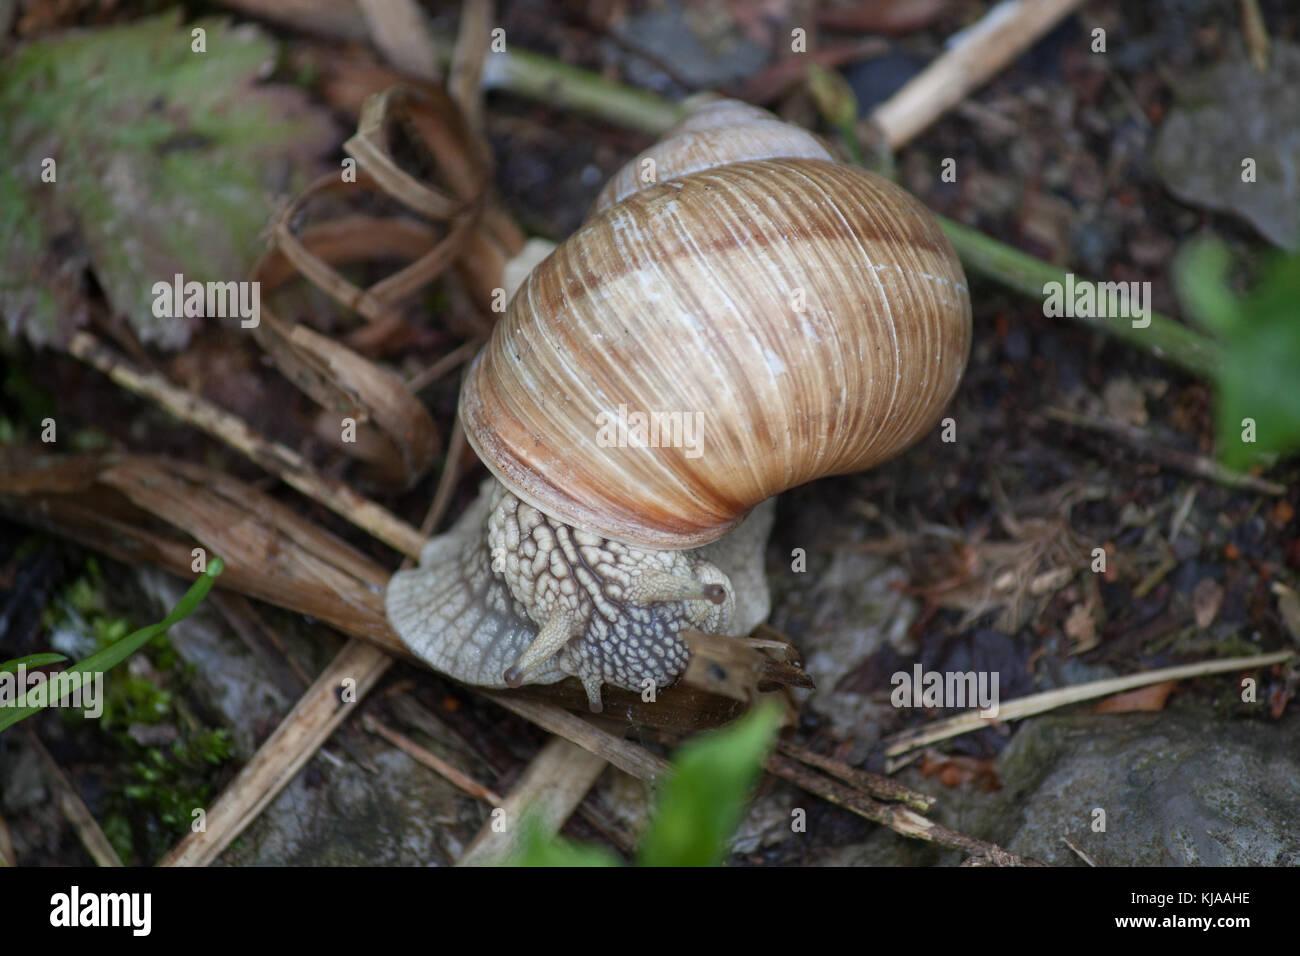 Cochlea Stockfoto, Bild: 166184970 - Alamy